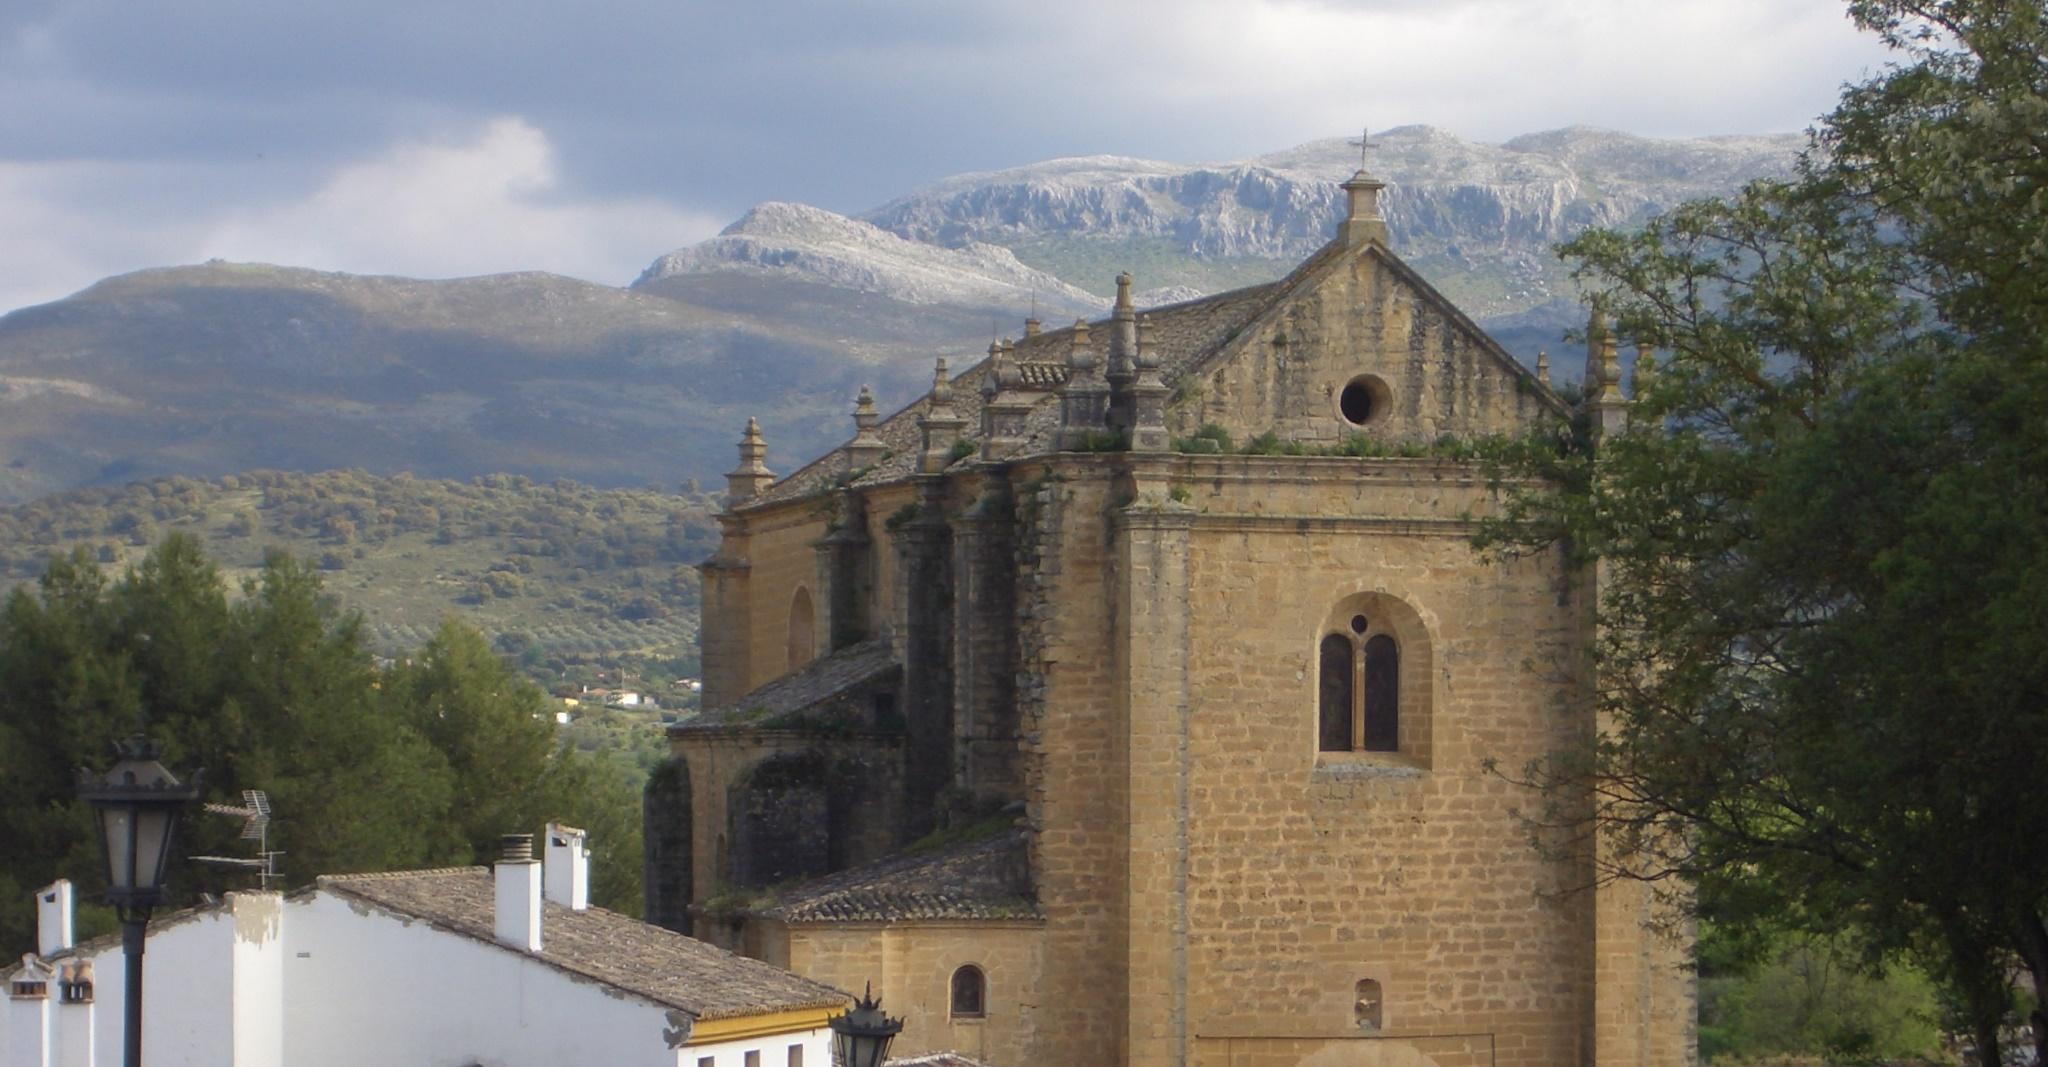 Kirche und Berge